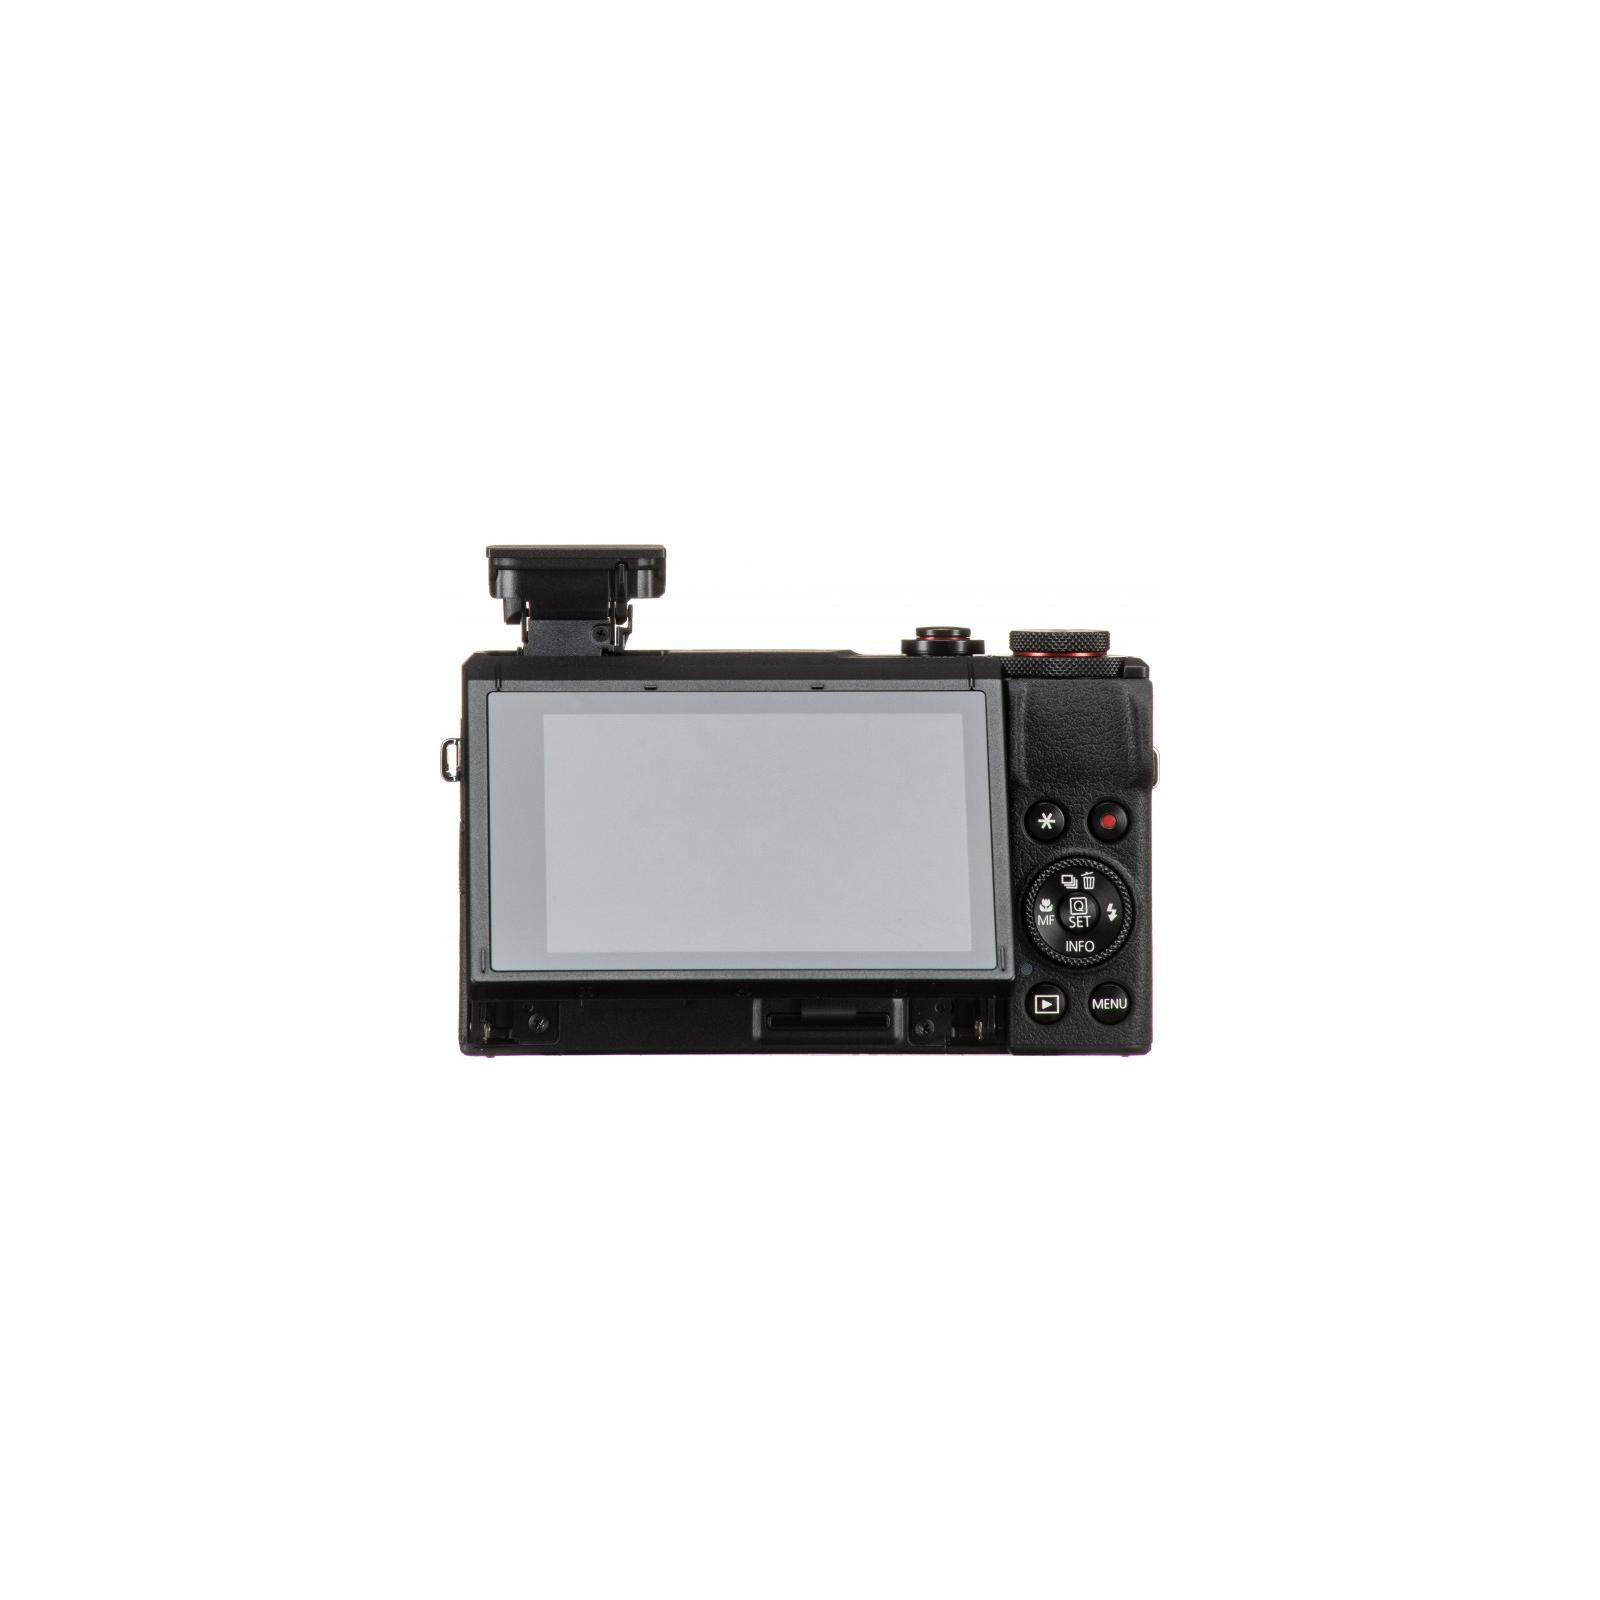 Цифровой фотоаппарат Canon Powershot G7 X Mark III Black (3637C013) изображение 7